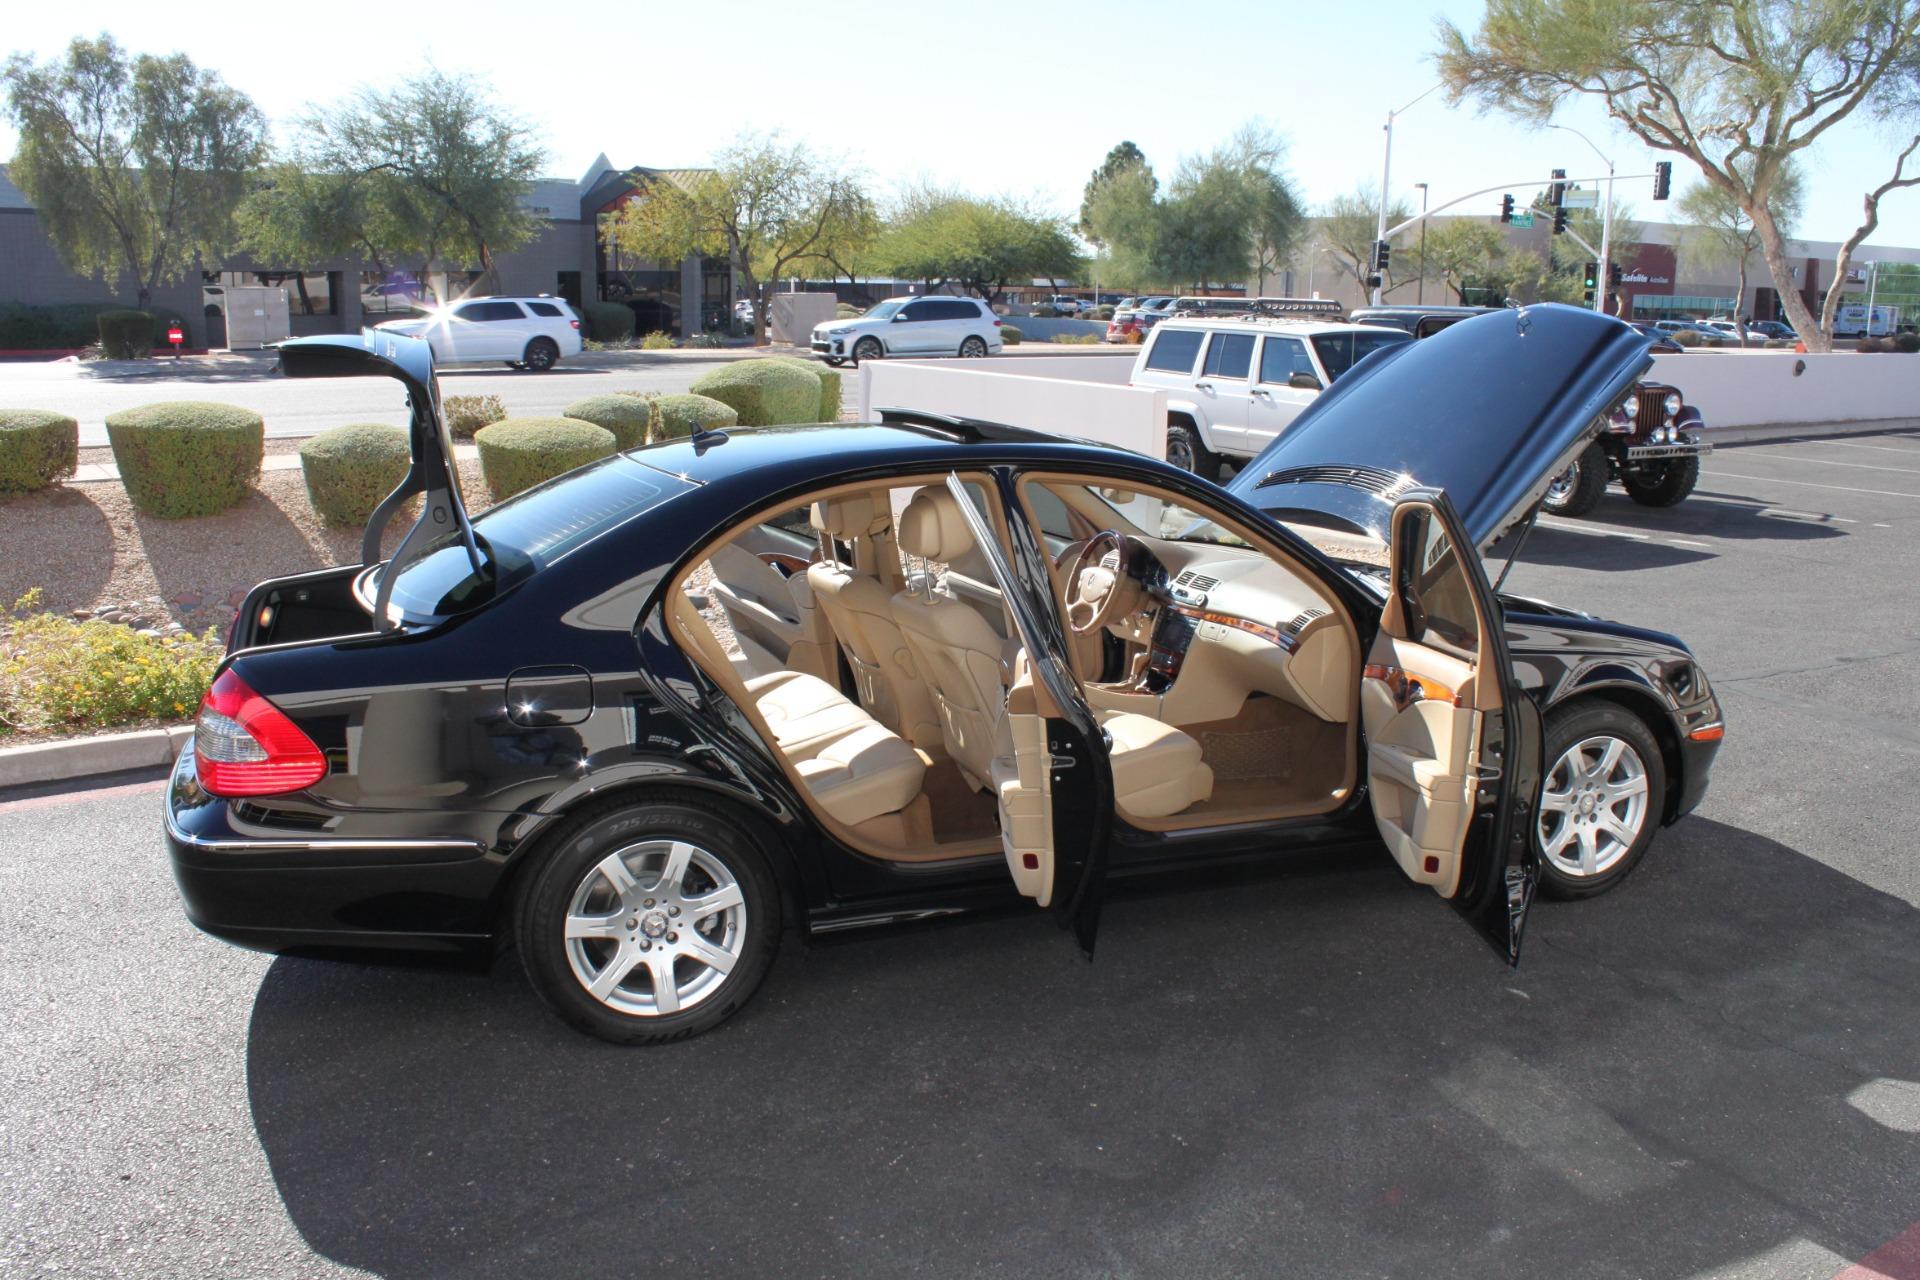 Used-2009-Mercedes-Benz-E-Class-E320-30L-BlueTEC-Ferrari